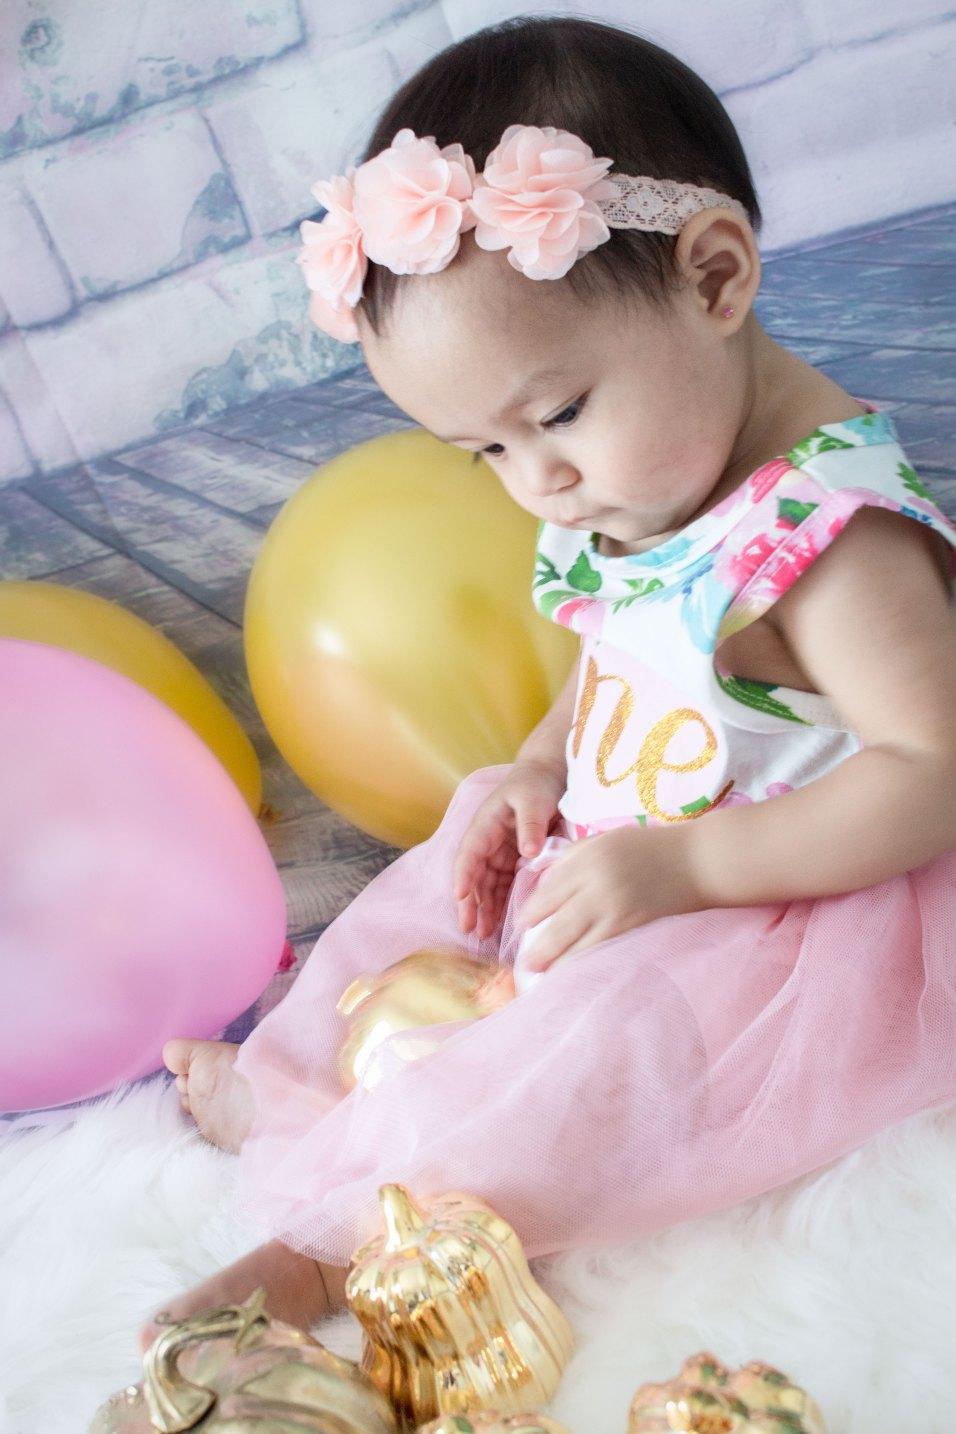 One Year Cake Smash Baby Girl Pink Flower Dress Sitting